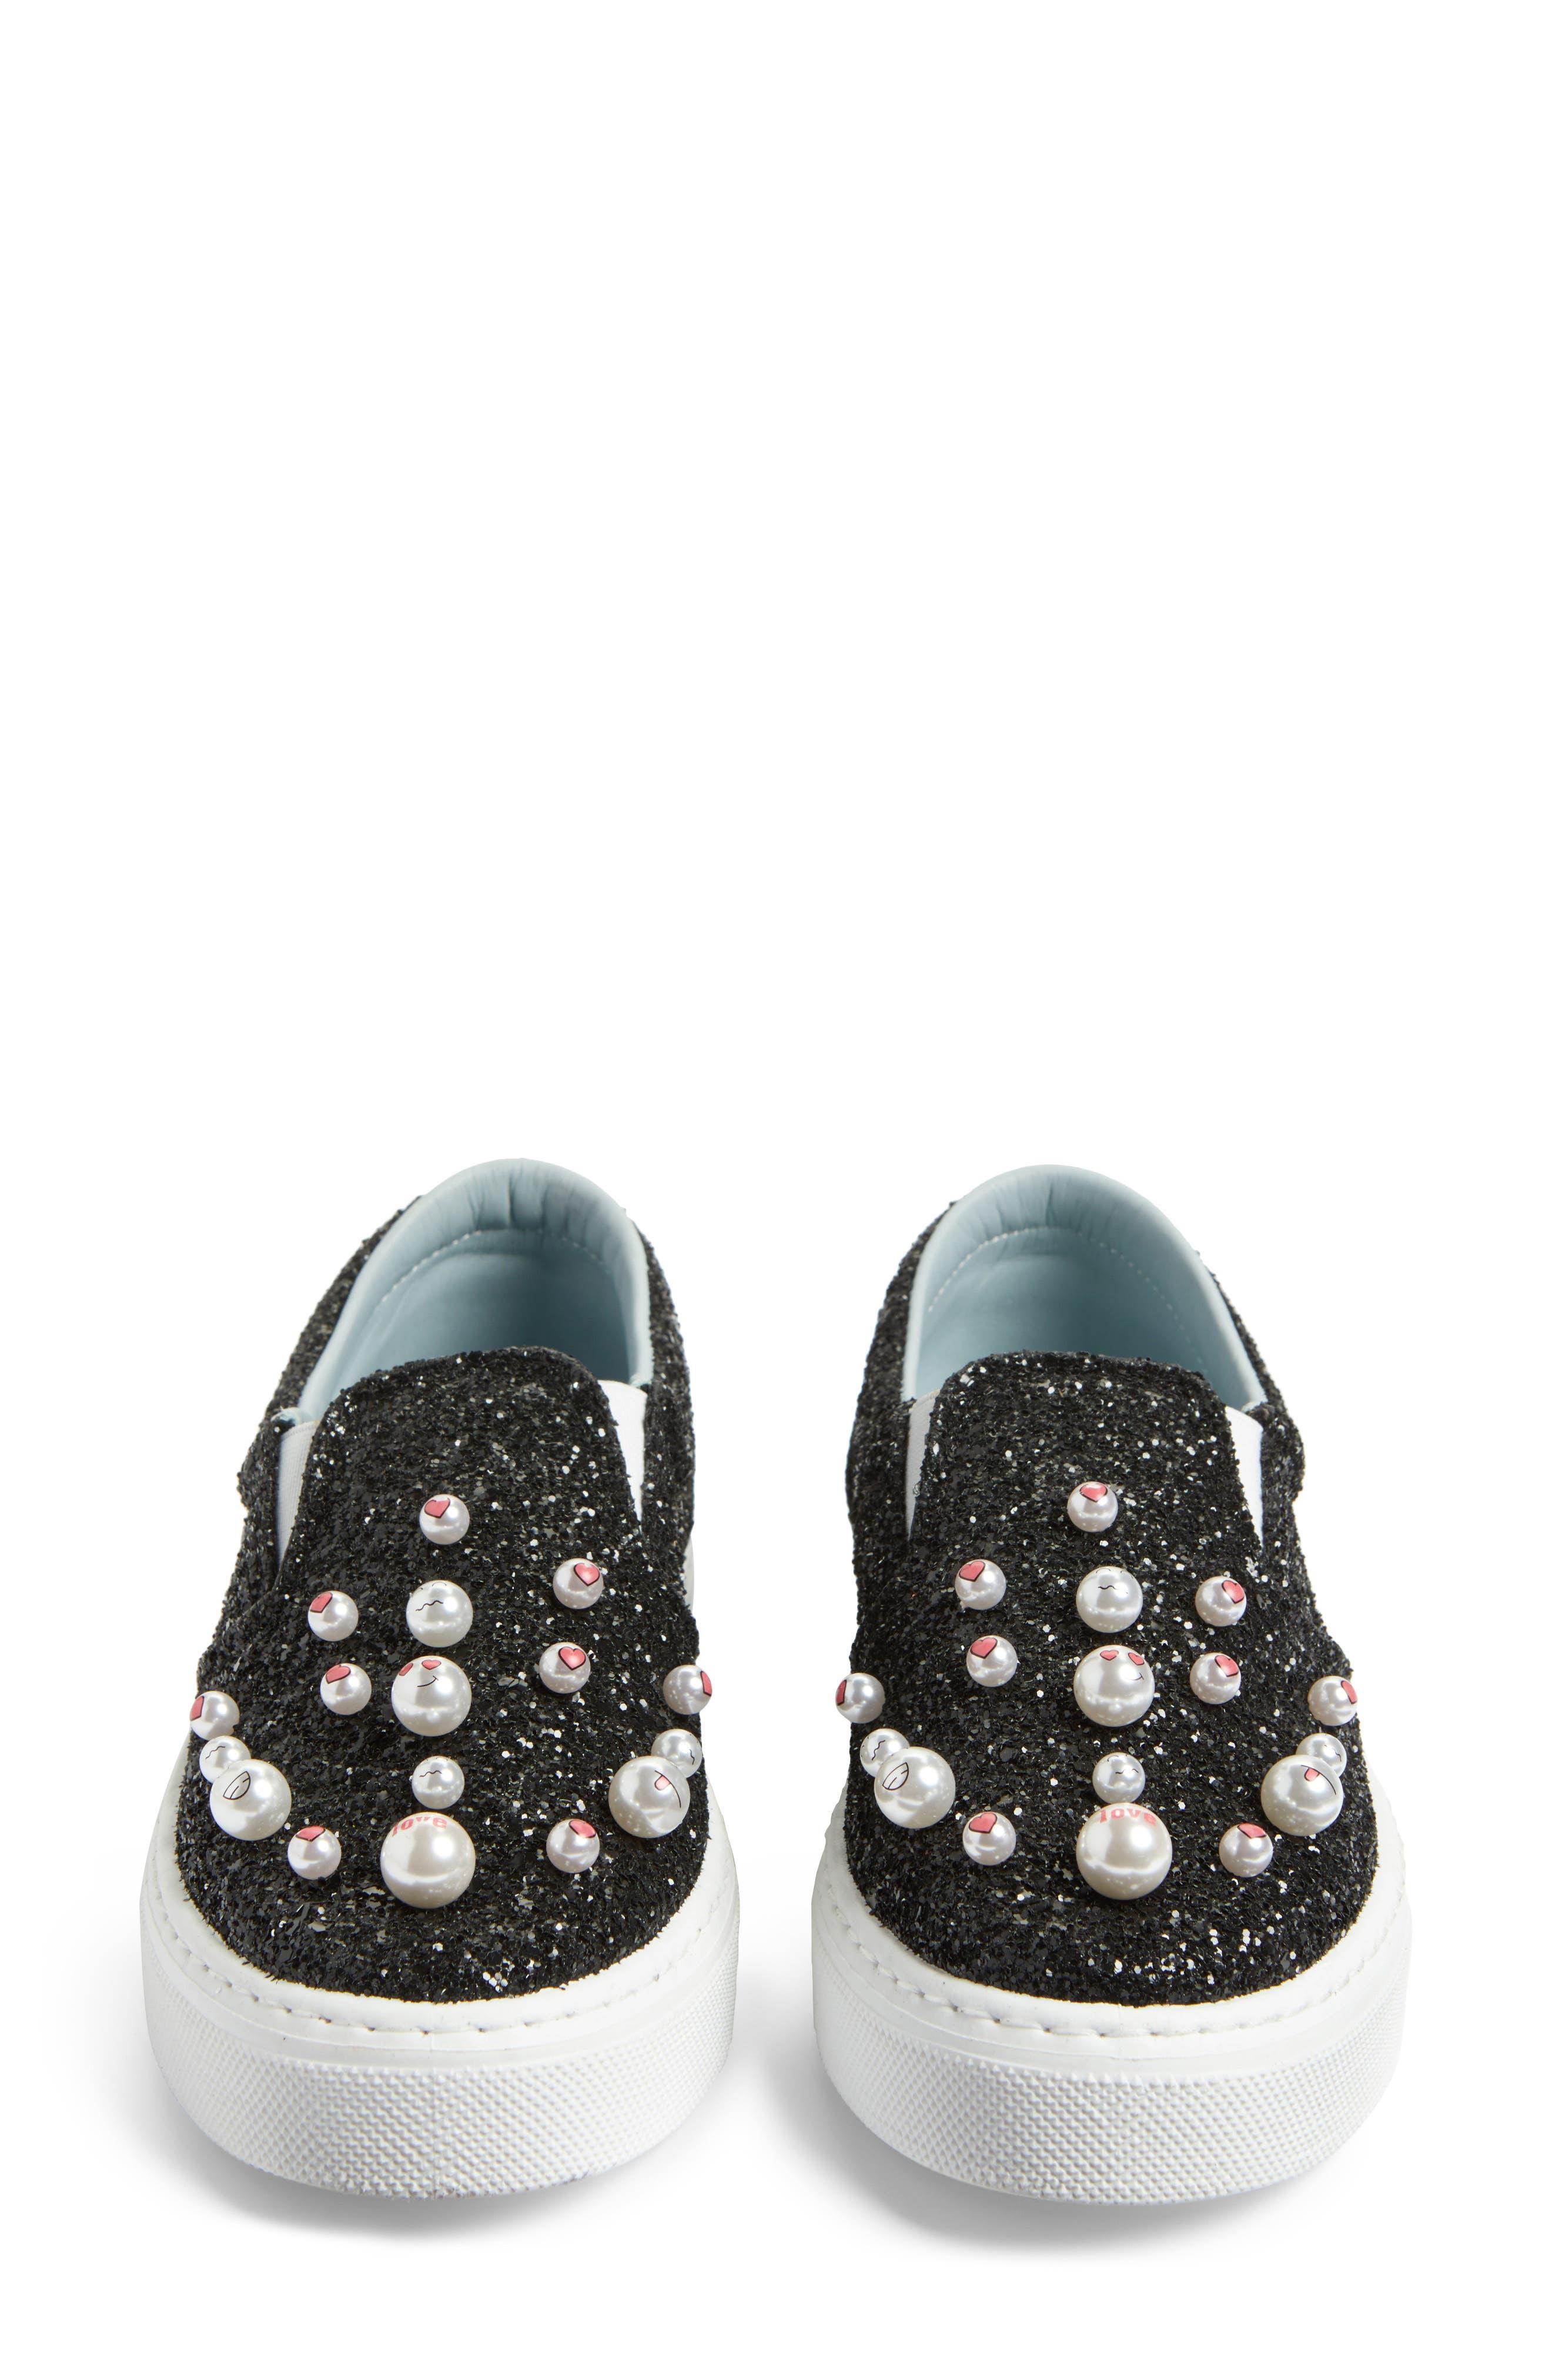 Candies Embellished Slip-On Sneaker,                             Alternate thumbnail 4, color,                             001